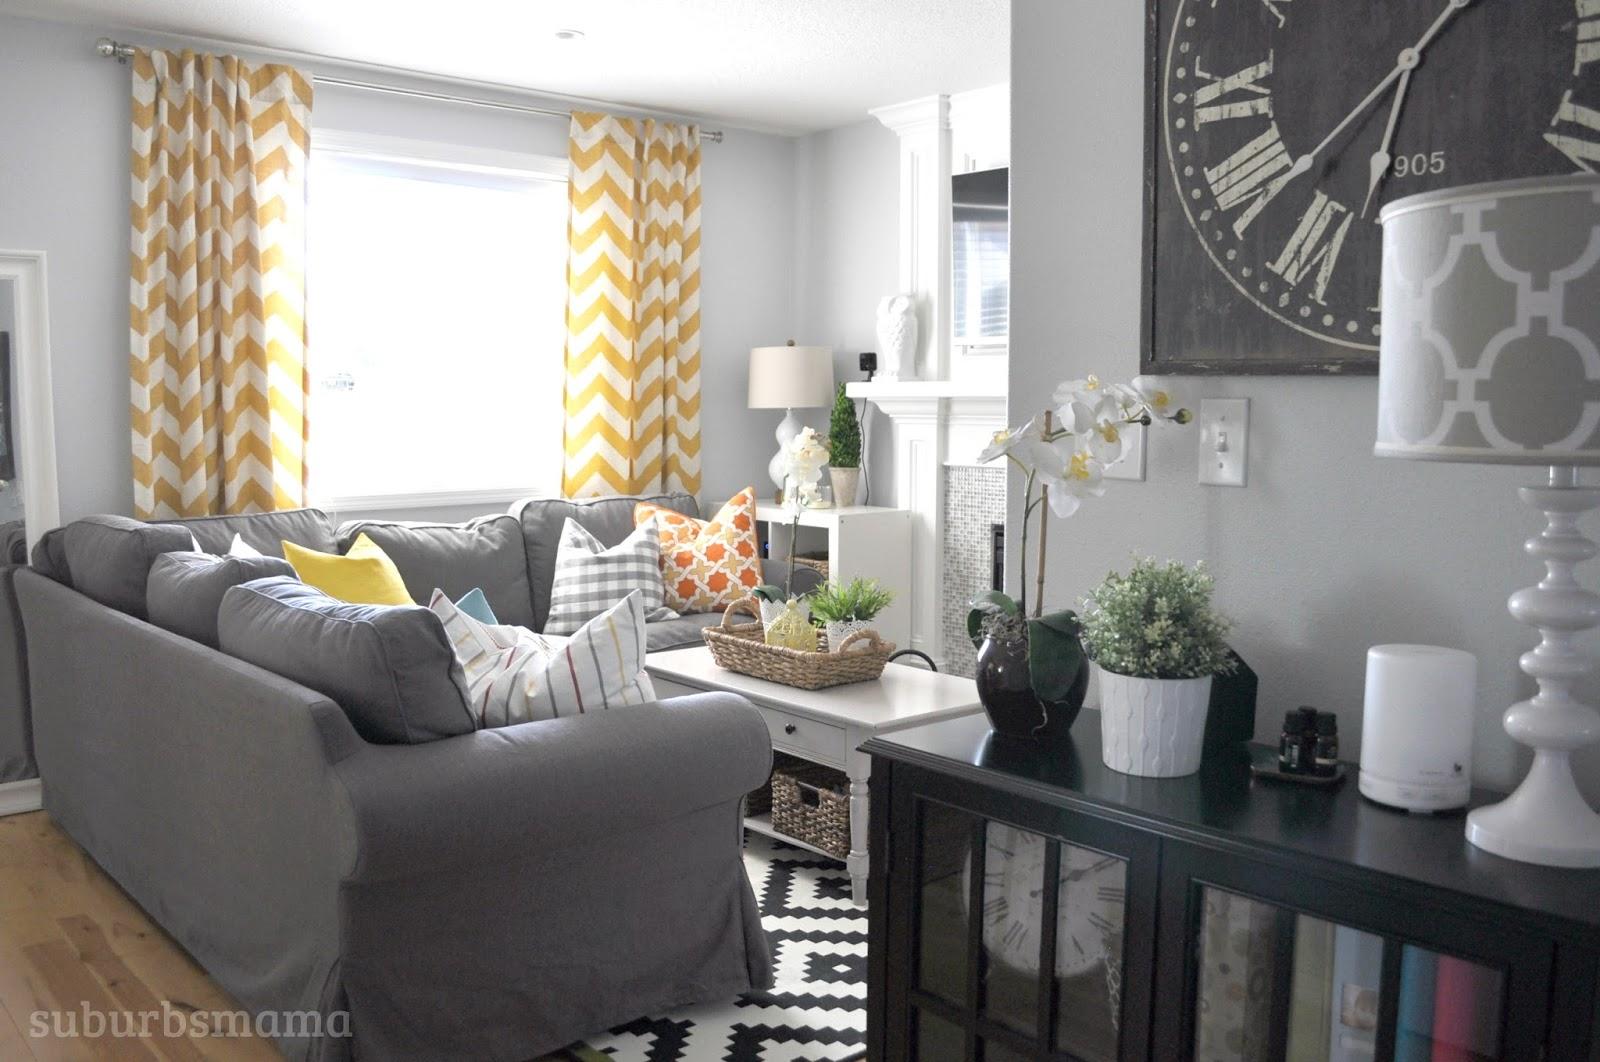 Suburbs Mama Family Room New Sectional